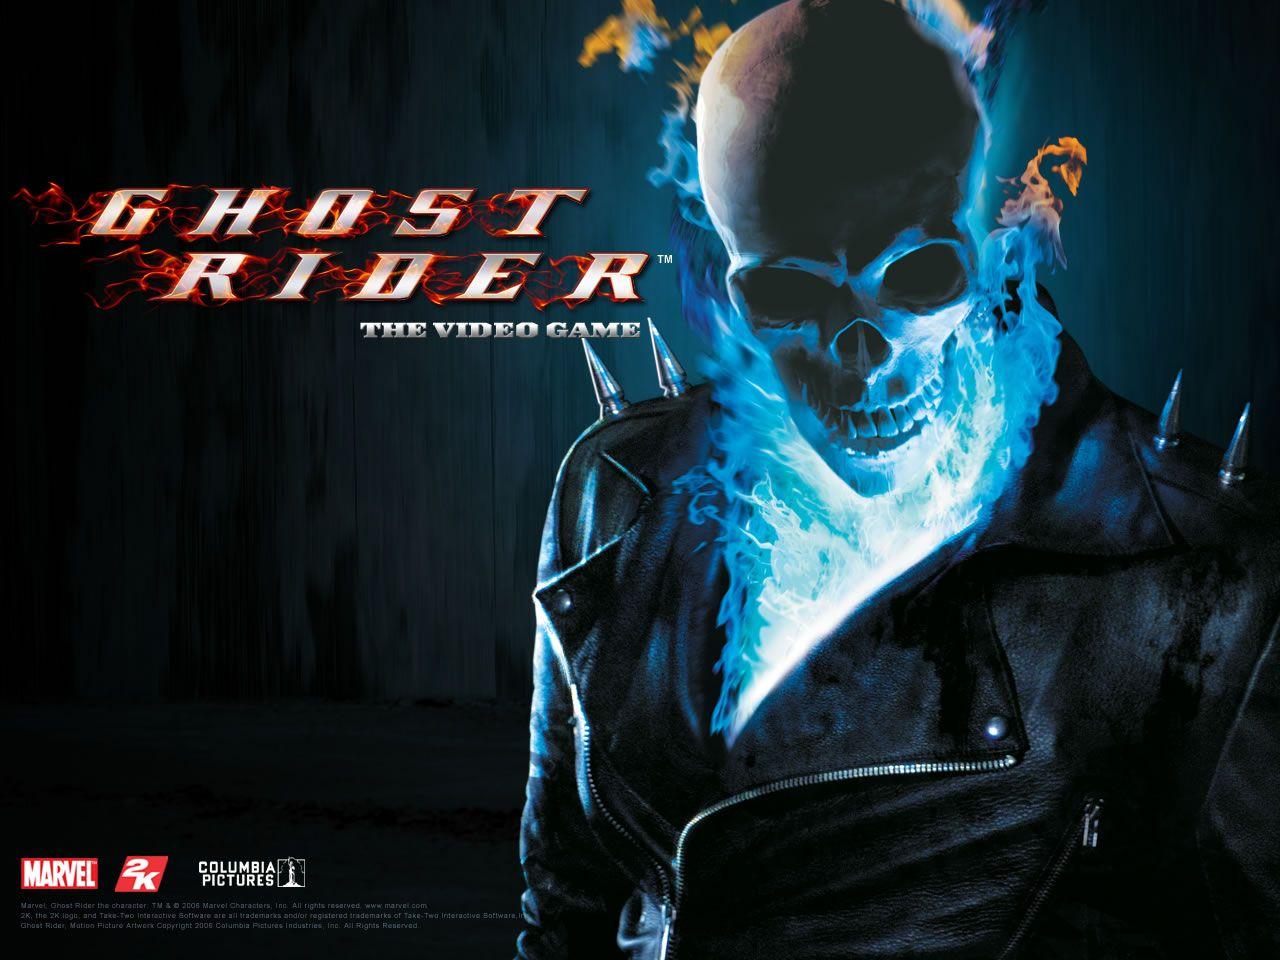 Top Wallpaper Horse Ghost Rider - cd6fd1e459560c5d14e5c9c8e22747b7  Perfect Image Reference_983283.jpg